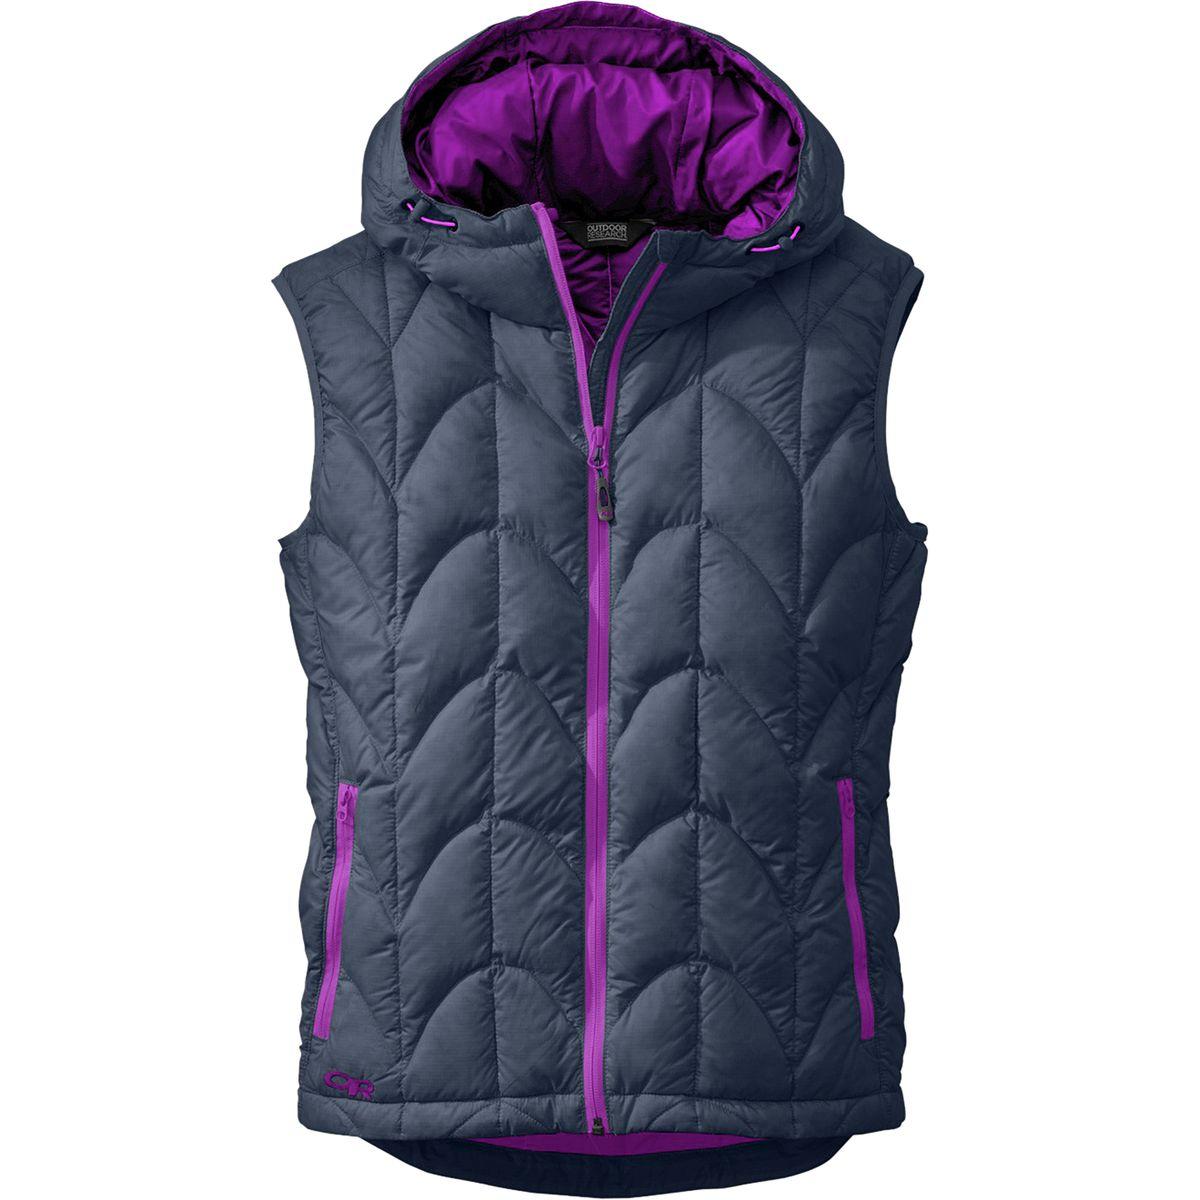 Outdoor Research Aria Down Vest - Women